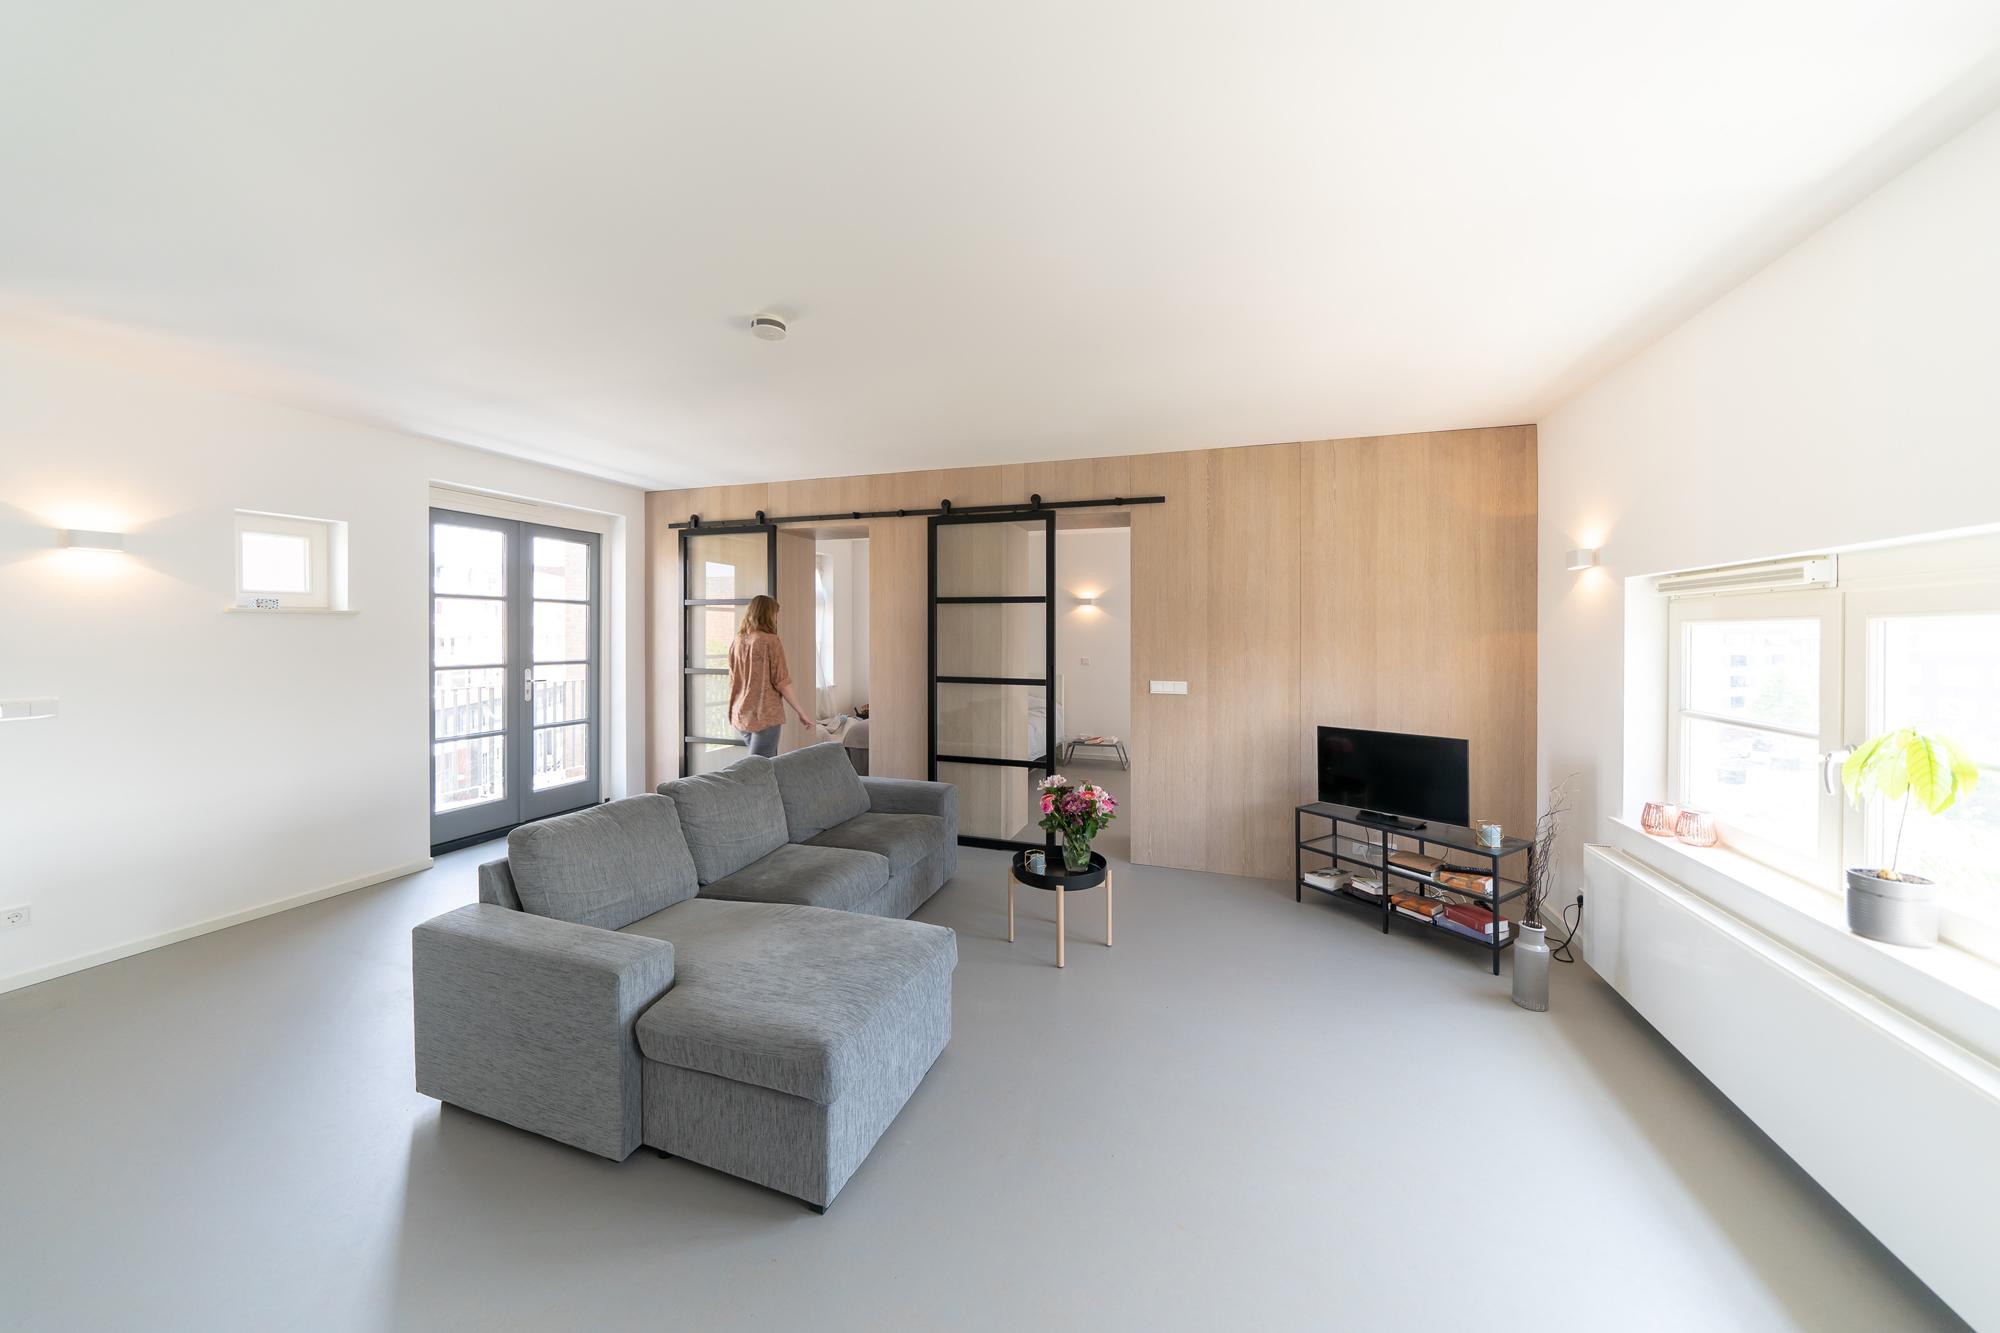 loft_spoortpunt_era_contour_renovatie_interieur